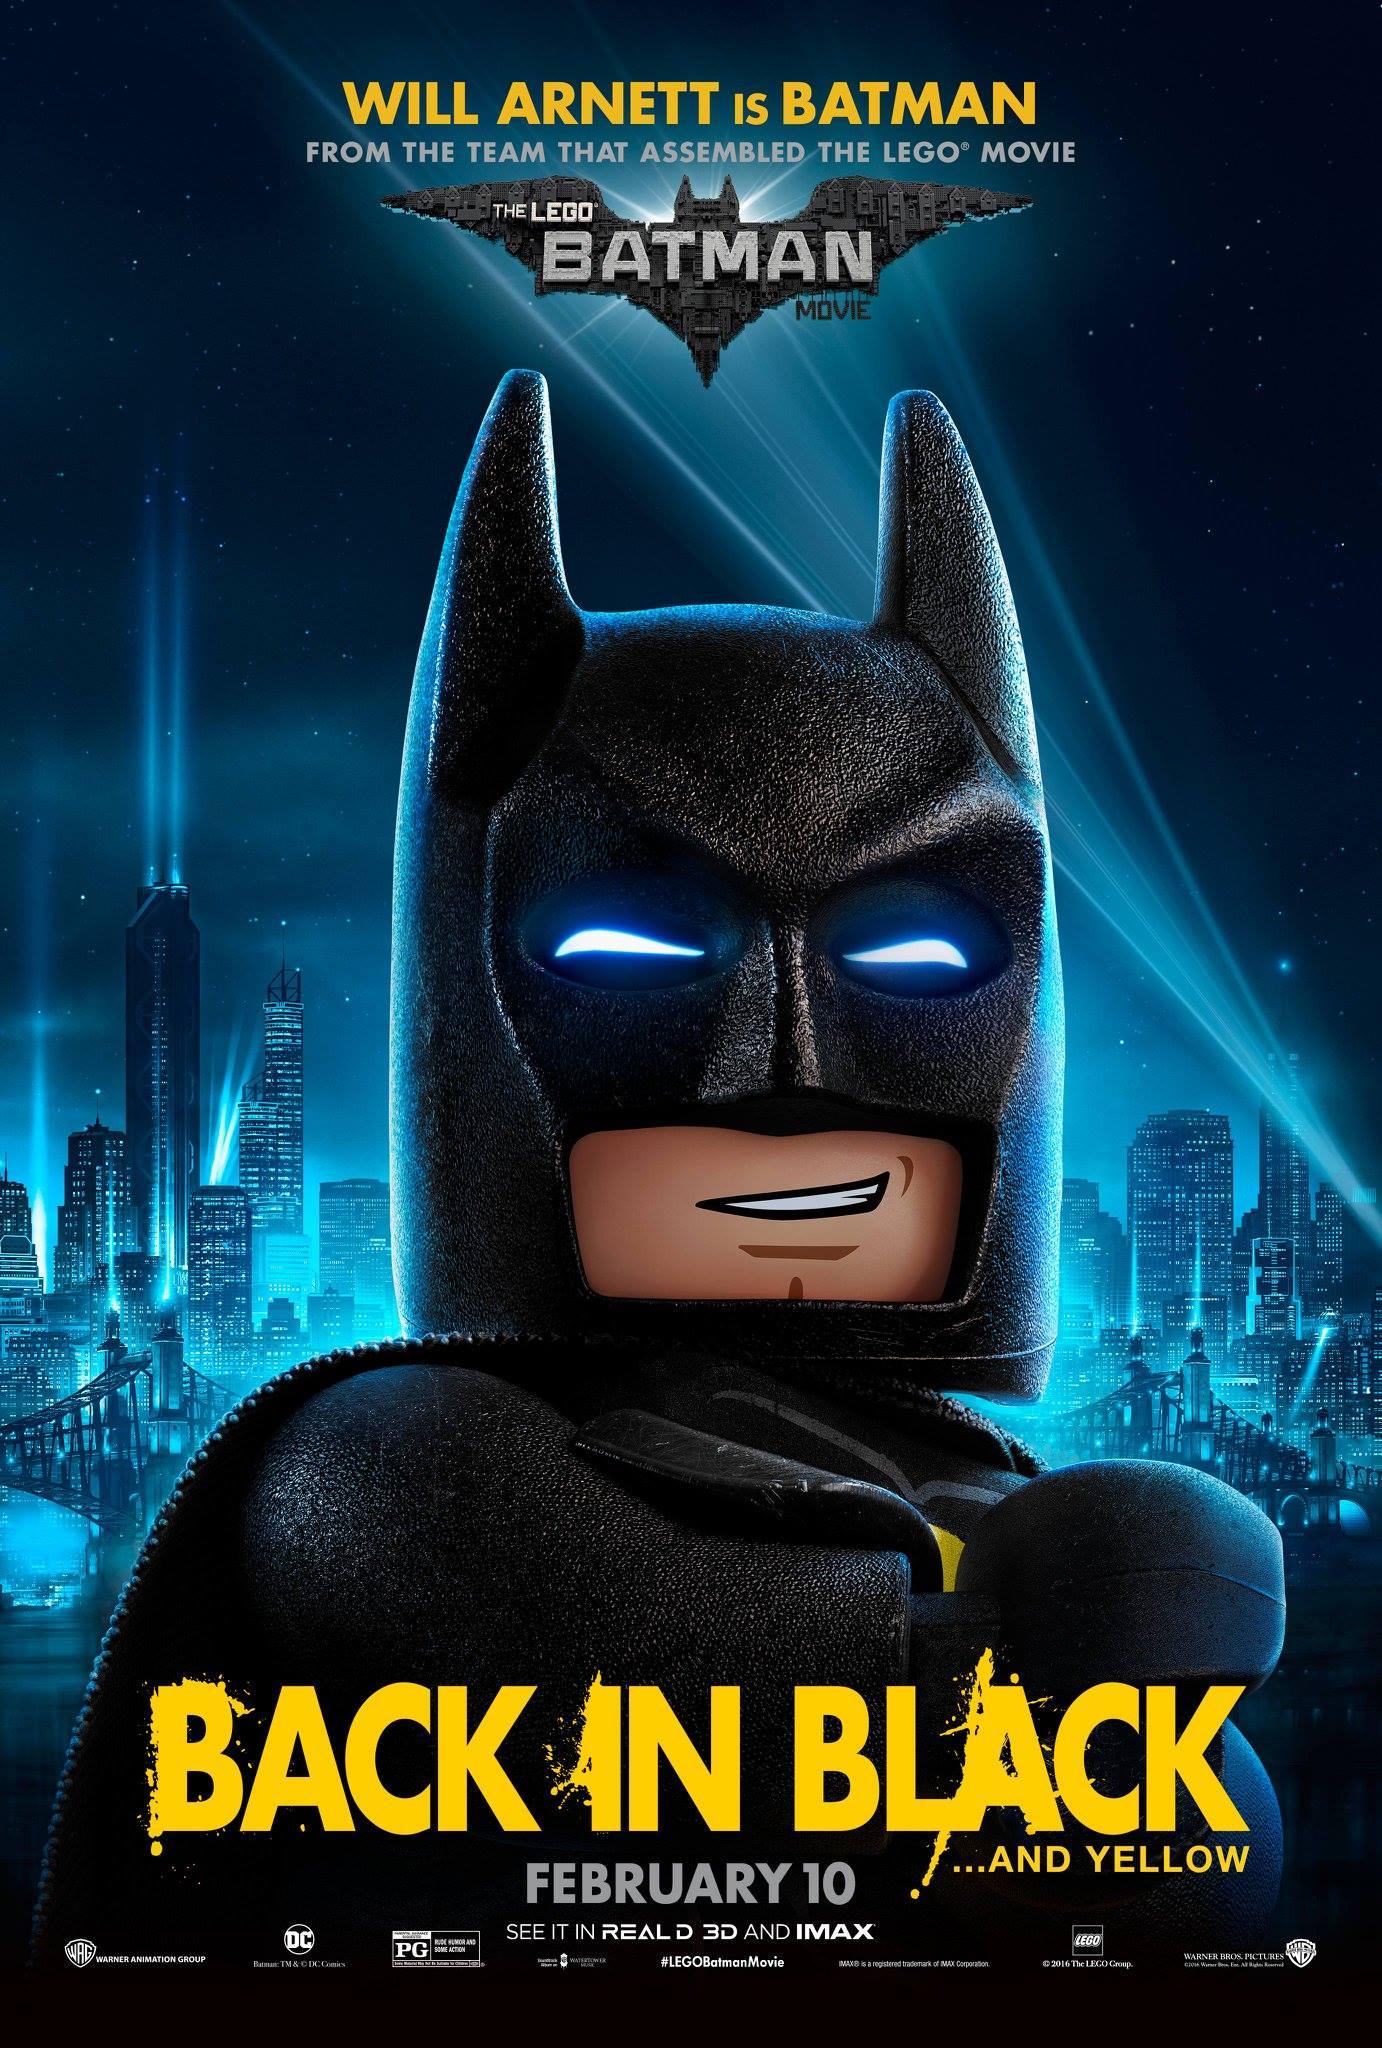 Лего Фильм Бэтмен The Lego Batman Movie 2017  Фильмы  Афиша